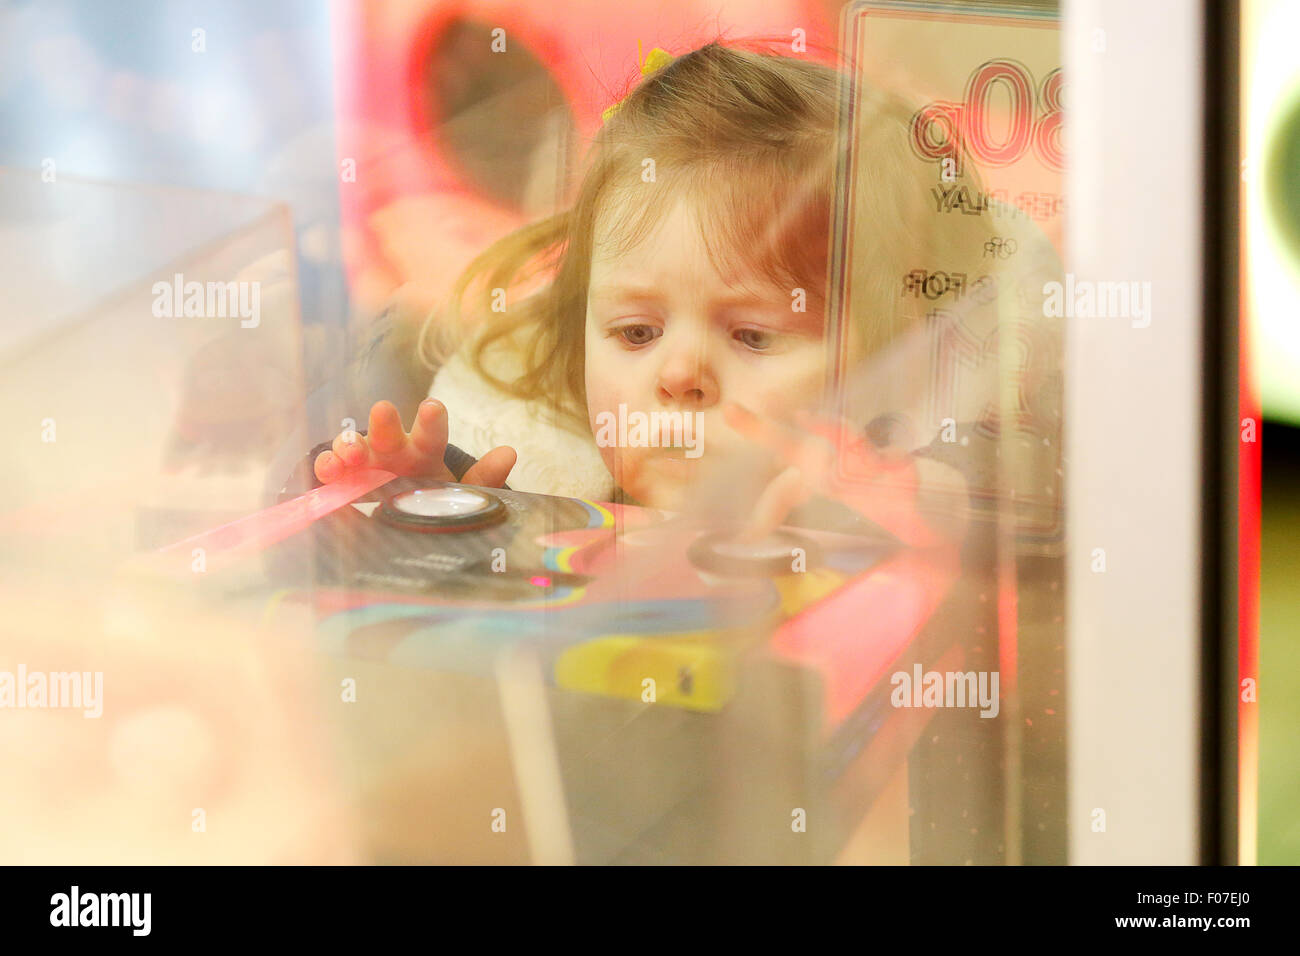 A child playing on a amusement arcade machine - Stock Image